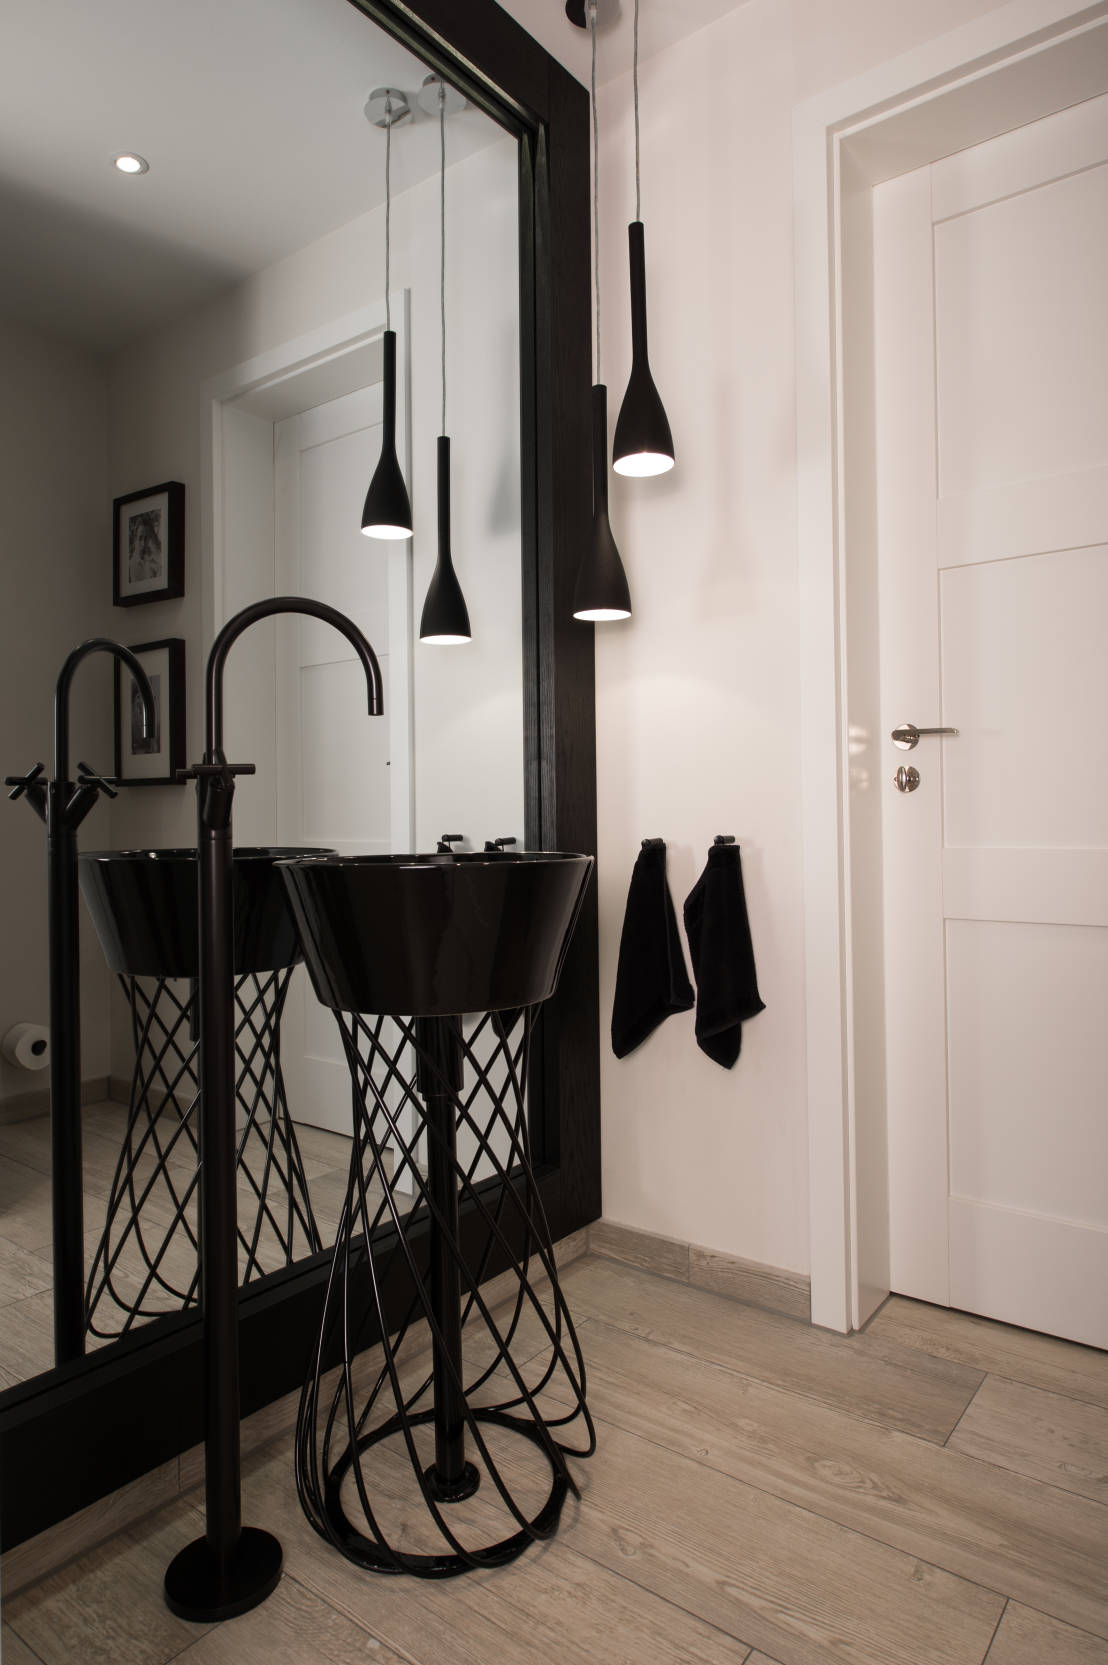 7 ausgefallene ideen f r 39 s bad. Black Bedroom Furniture Sets. Home Design Ideas